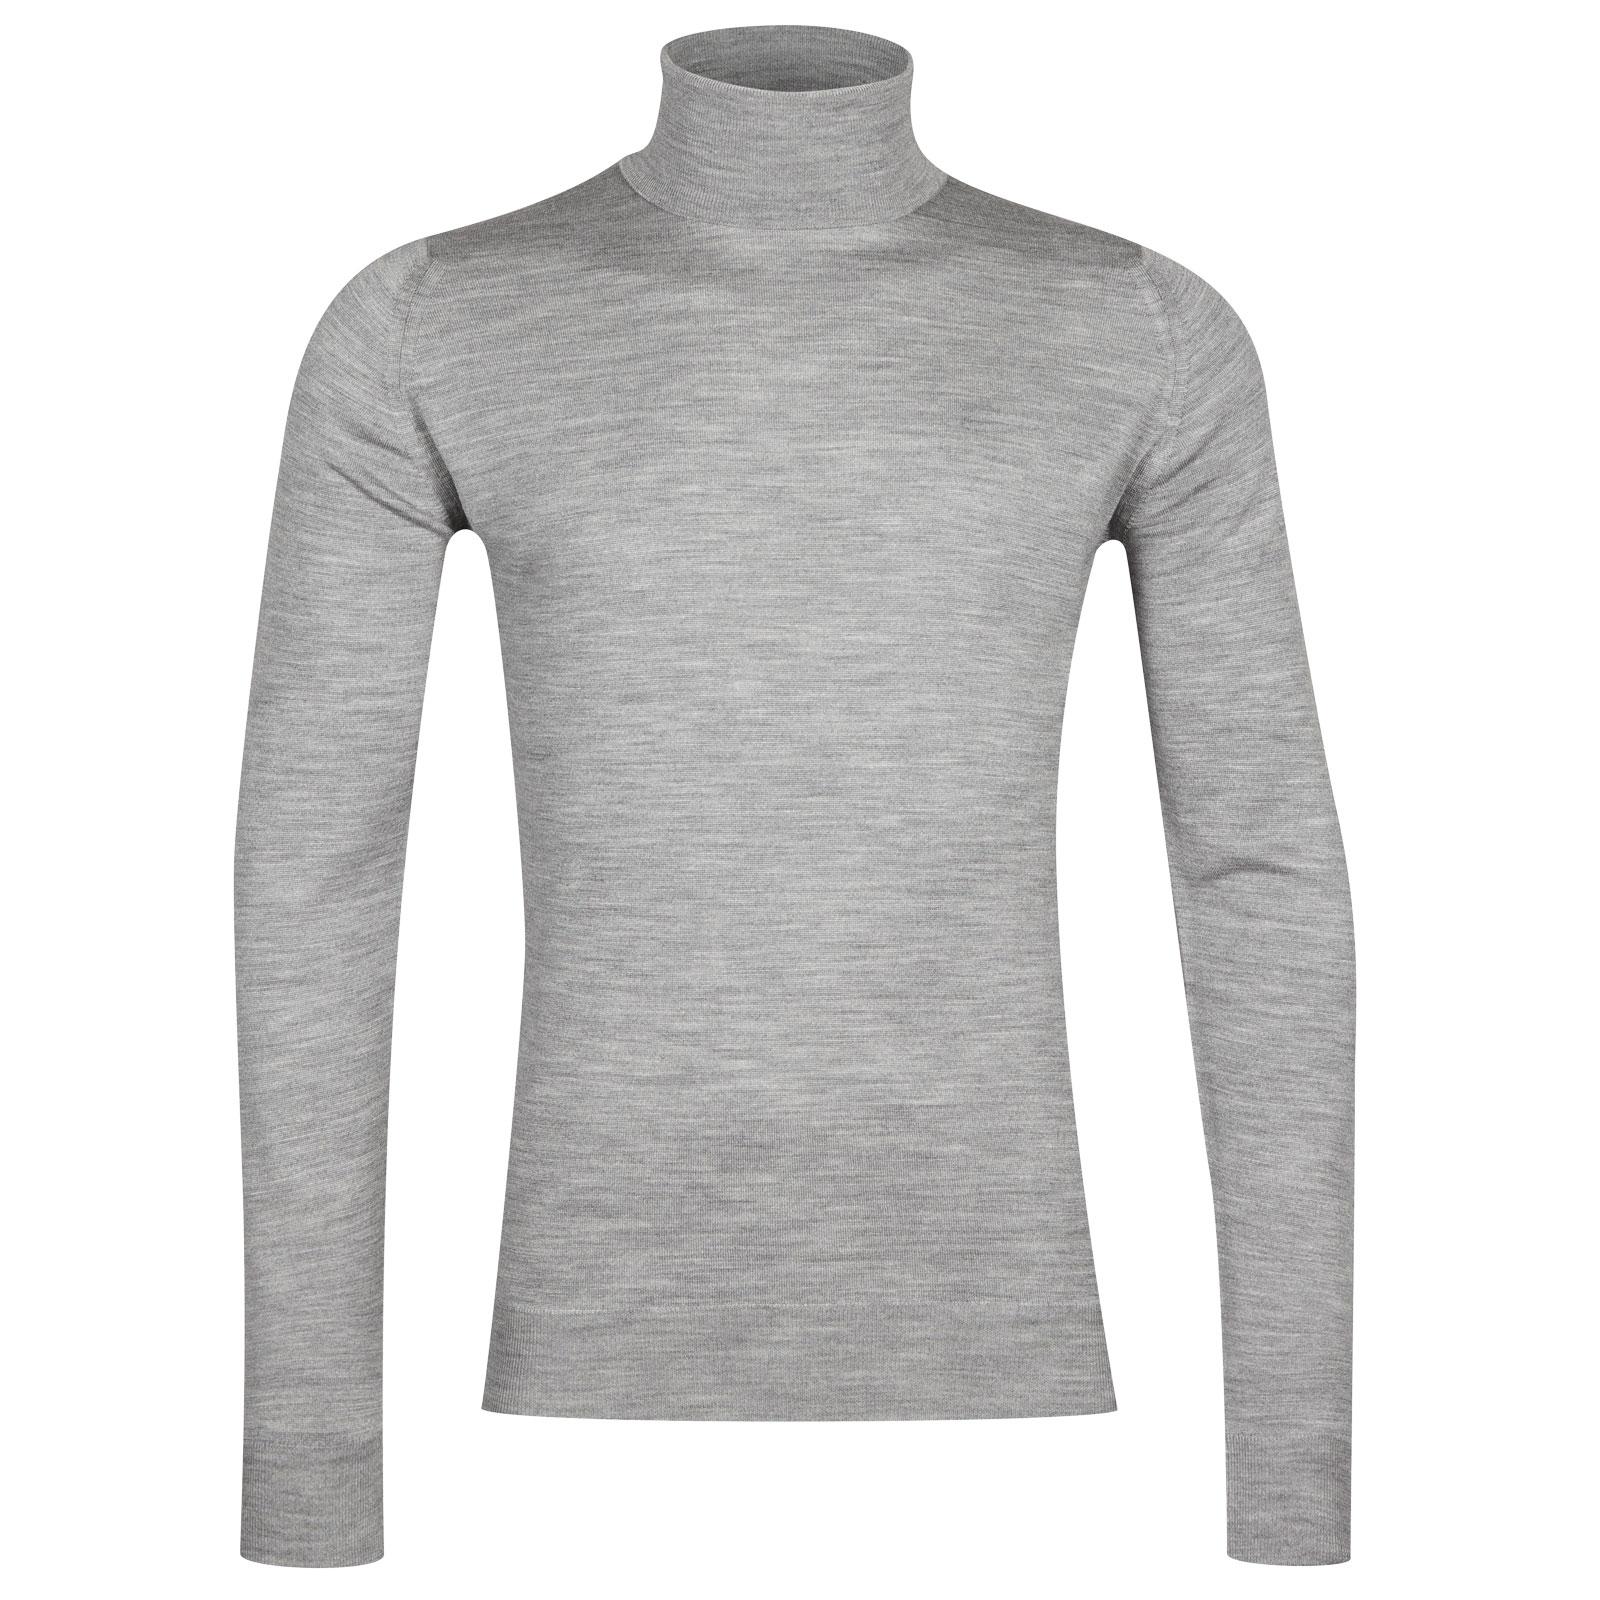 John Smedley cherwell Merino Wool Pullover in Silver-S